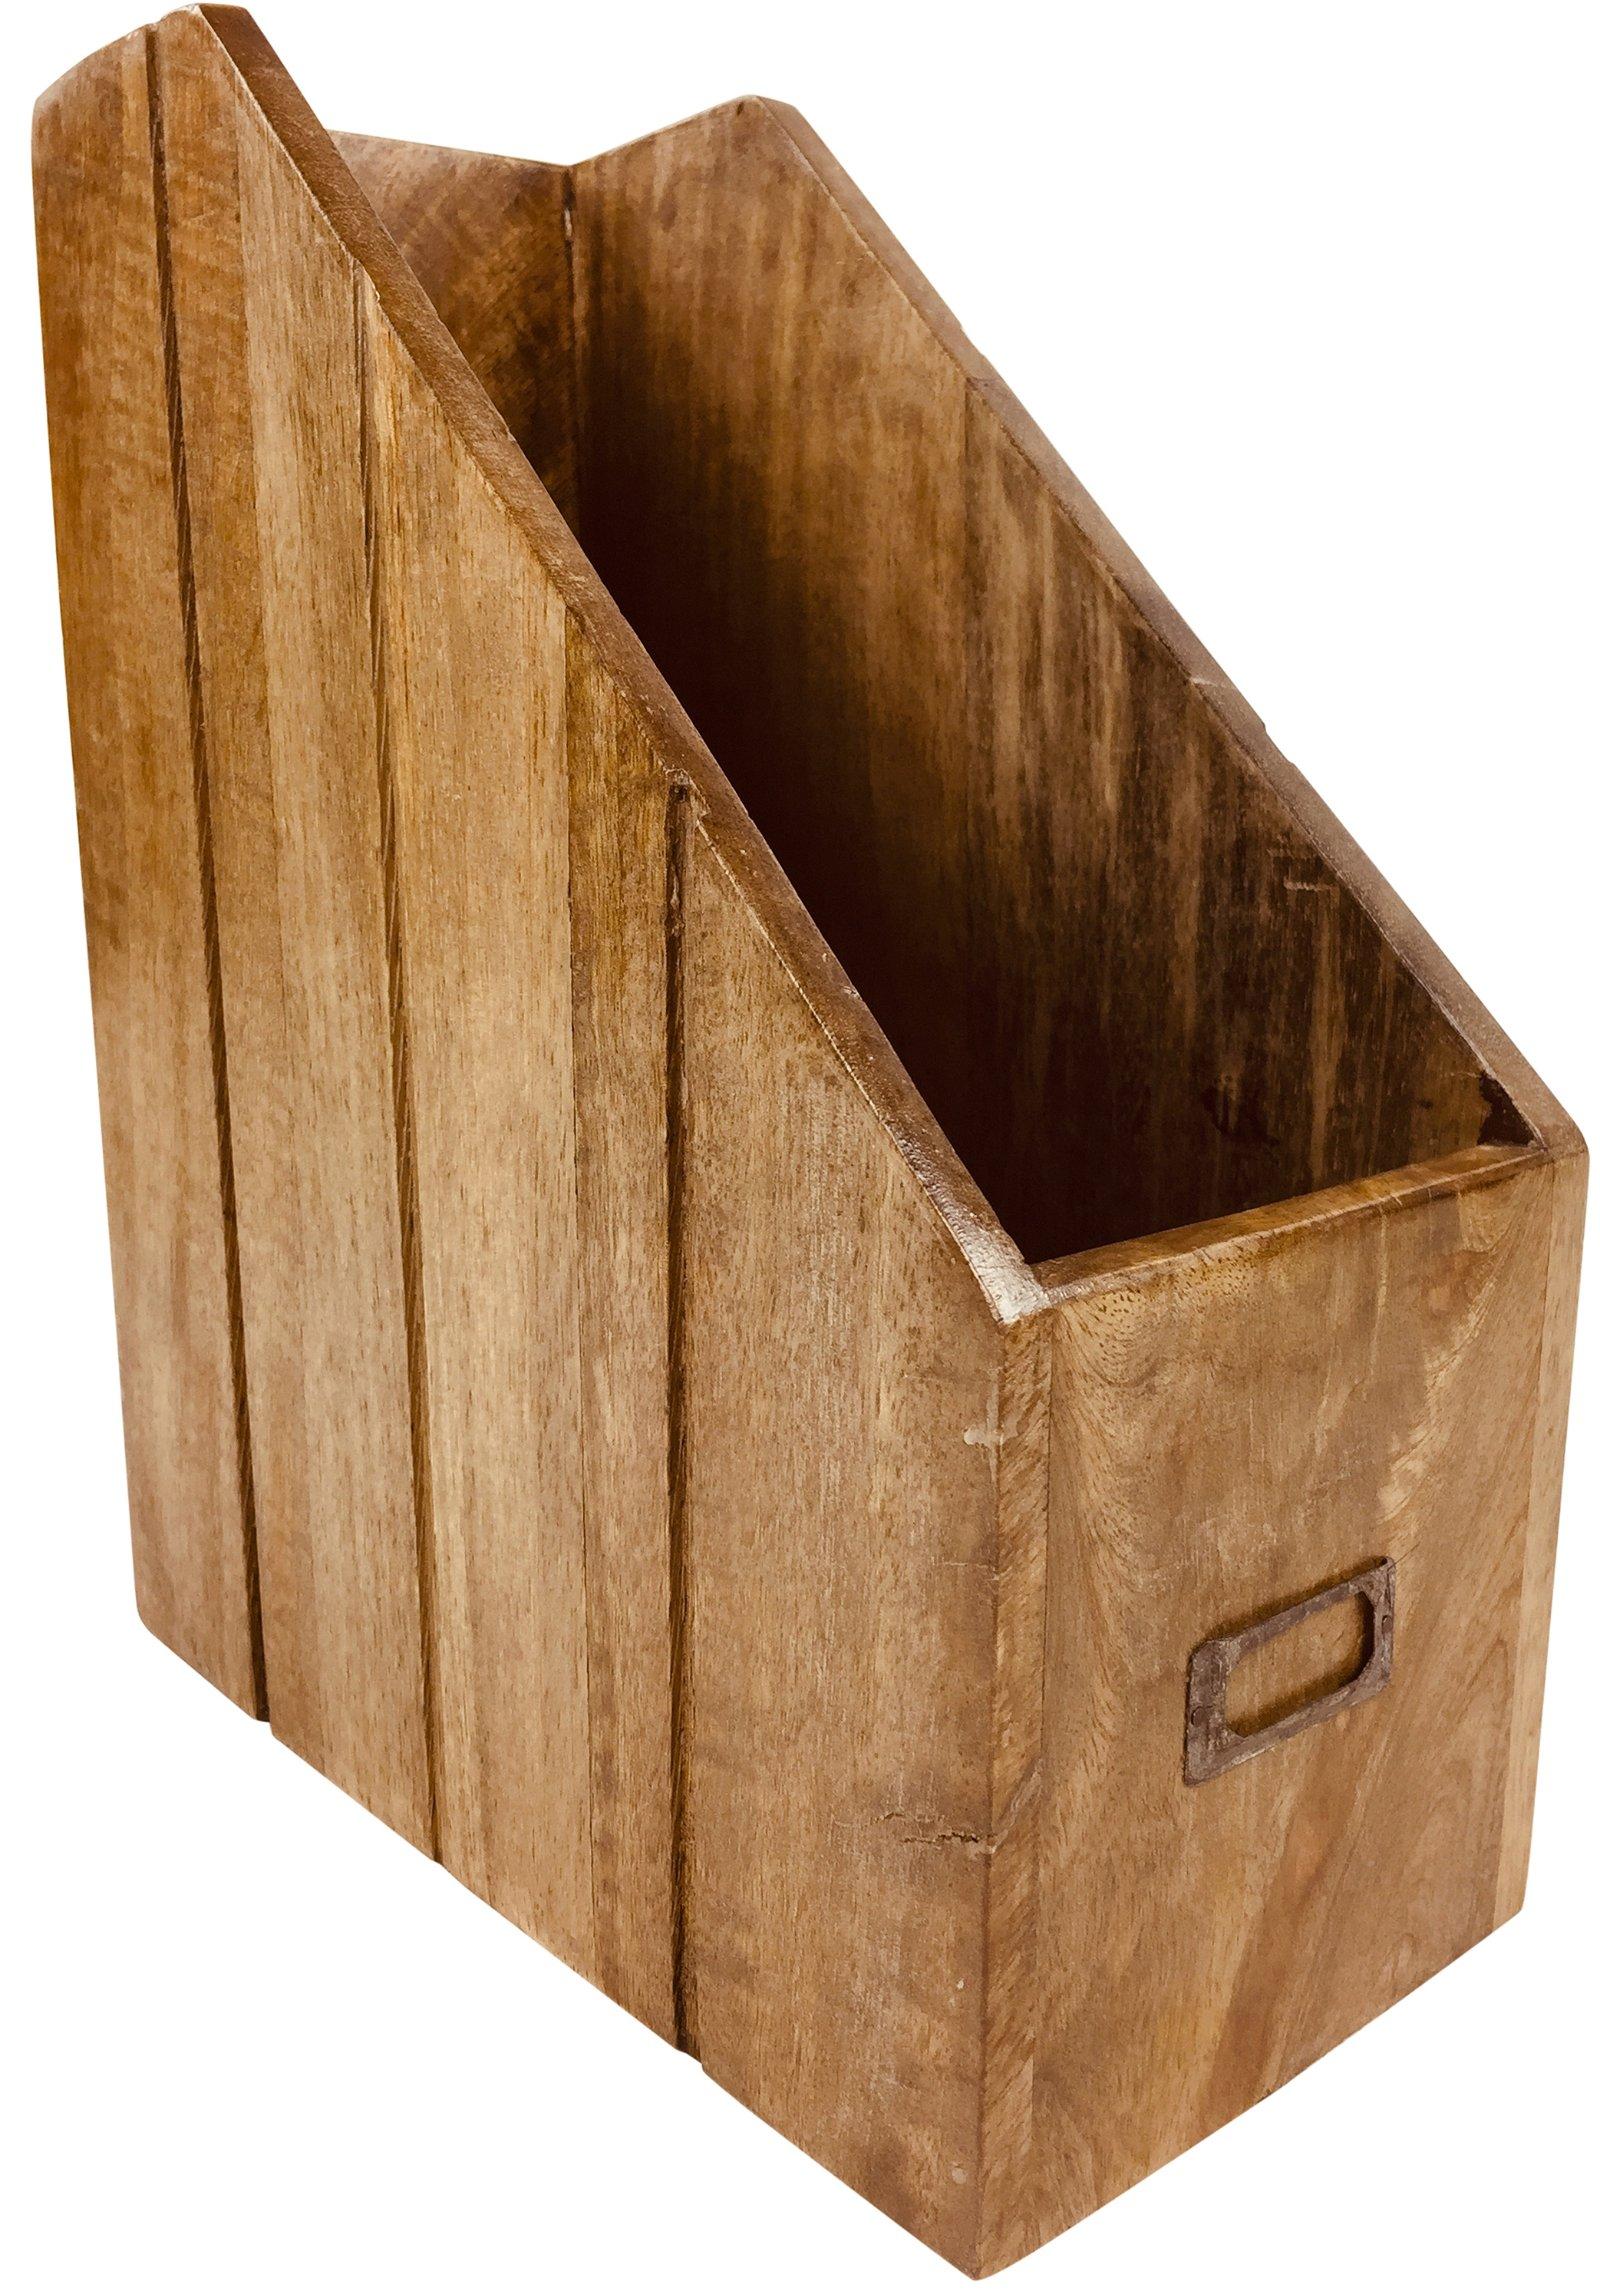 Solid Wood Magazine Organiser